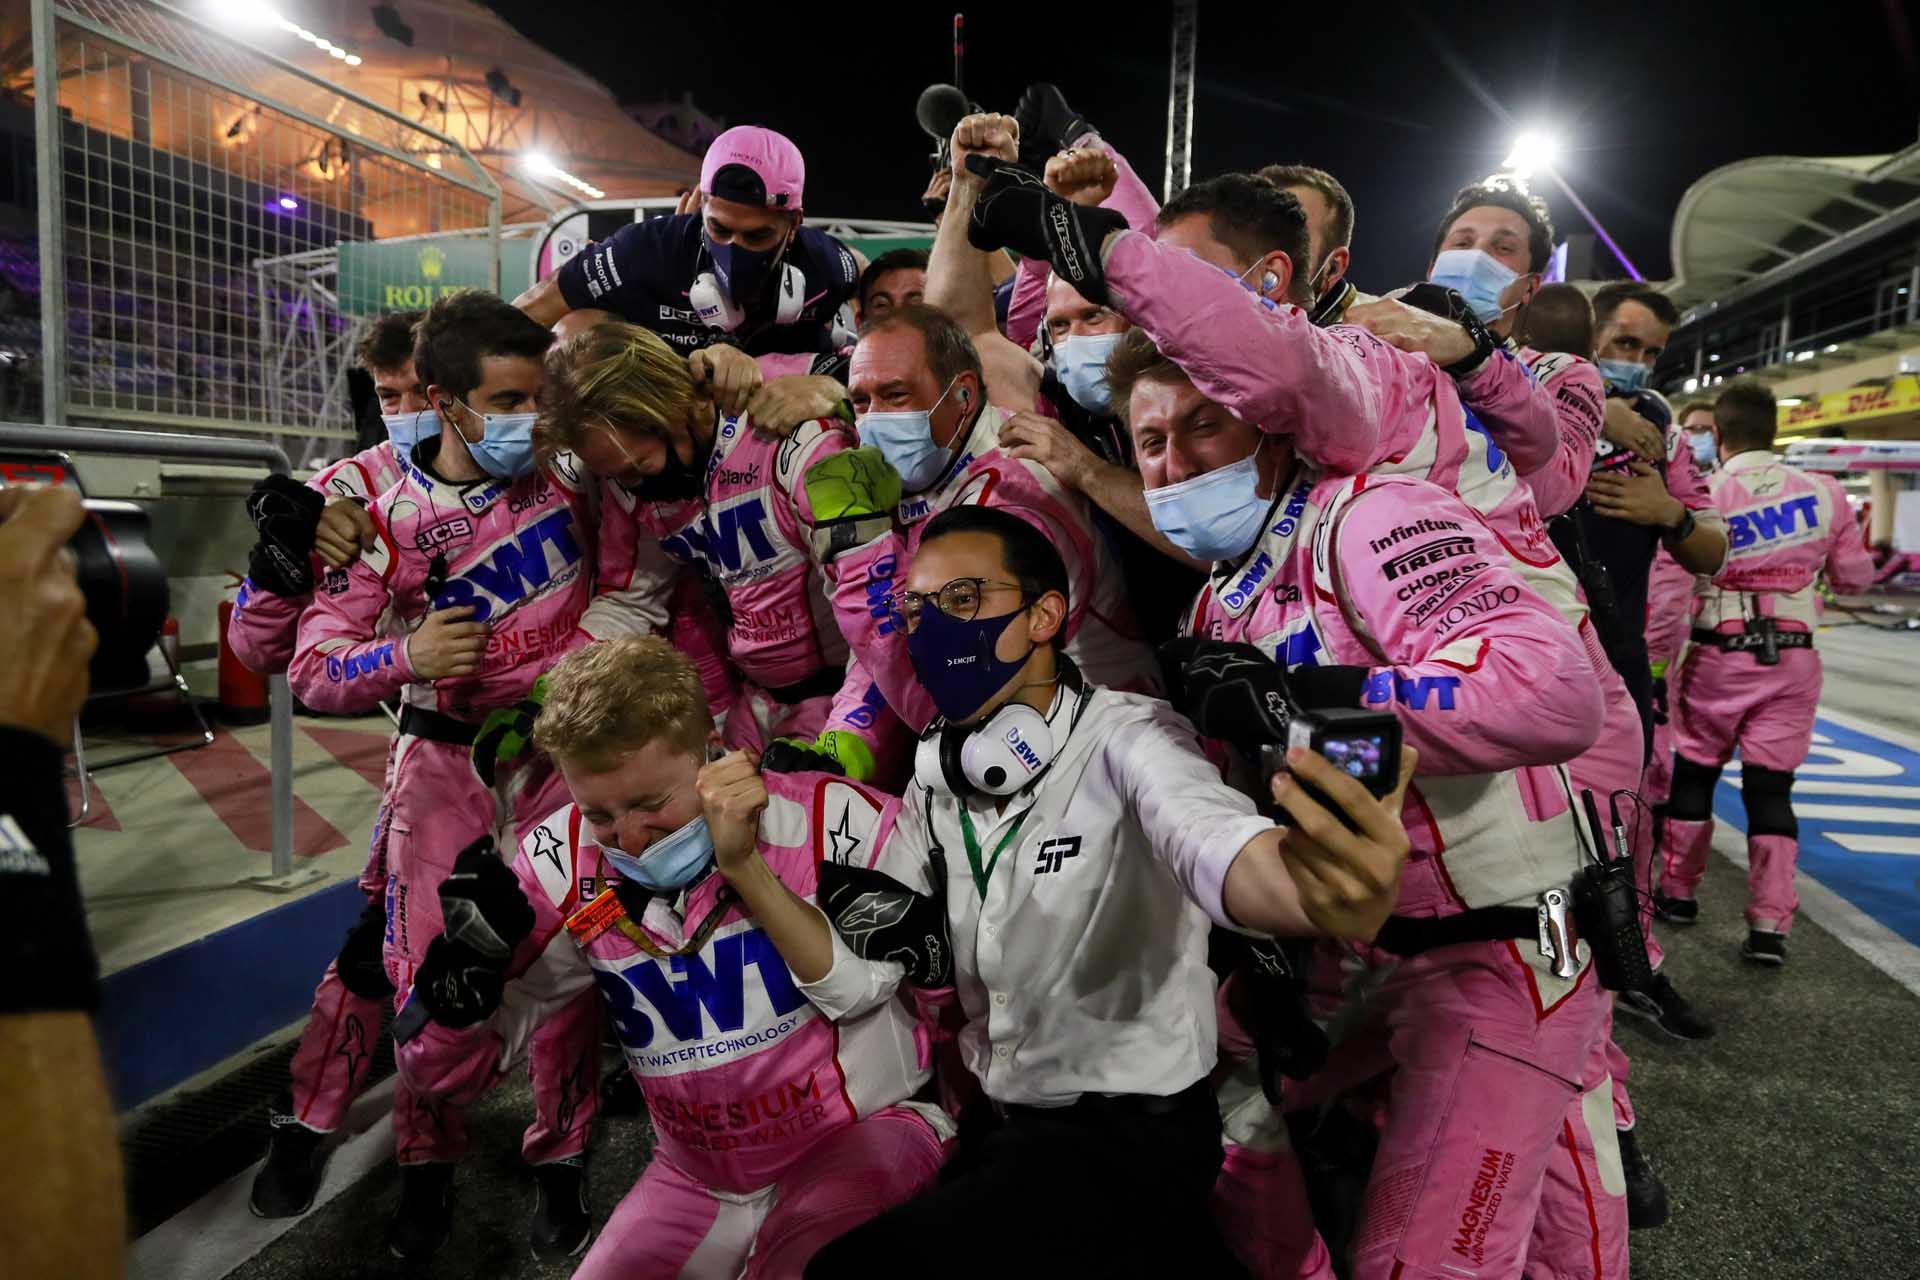 Racing point Team members celebrating in parc ferme